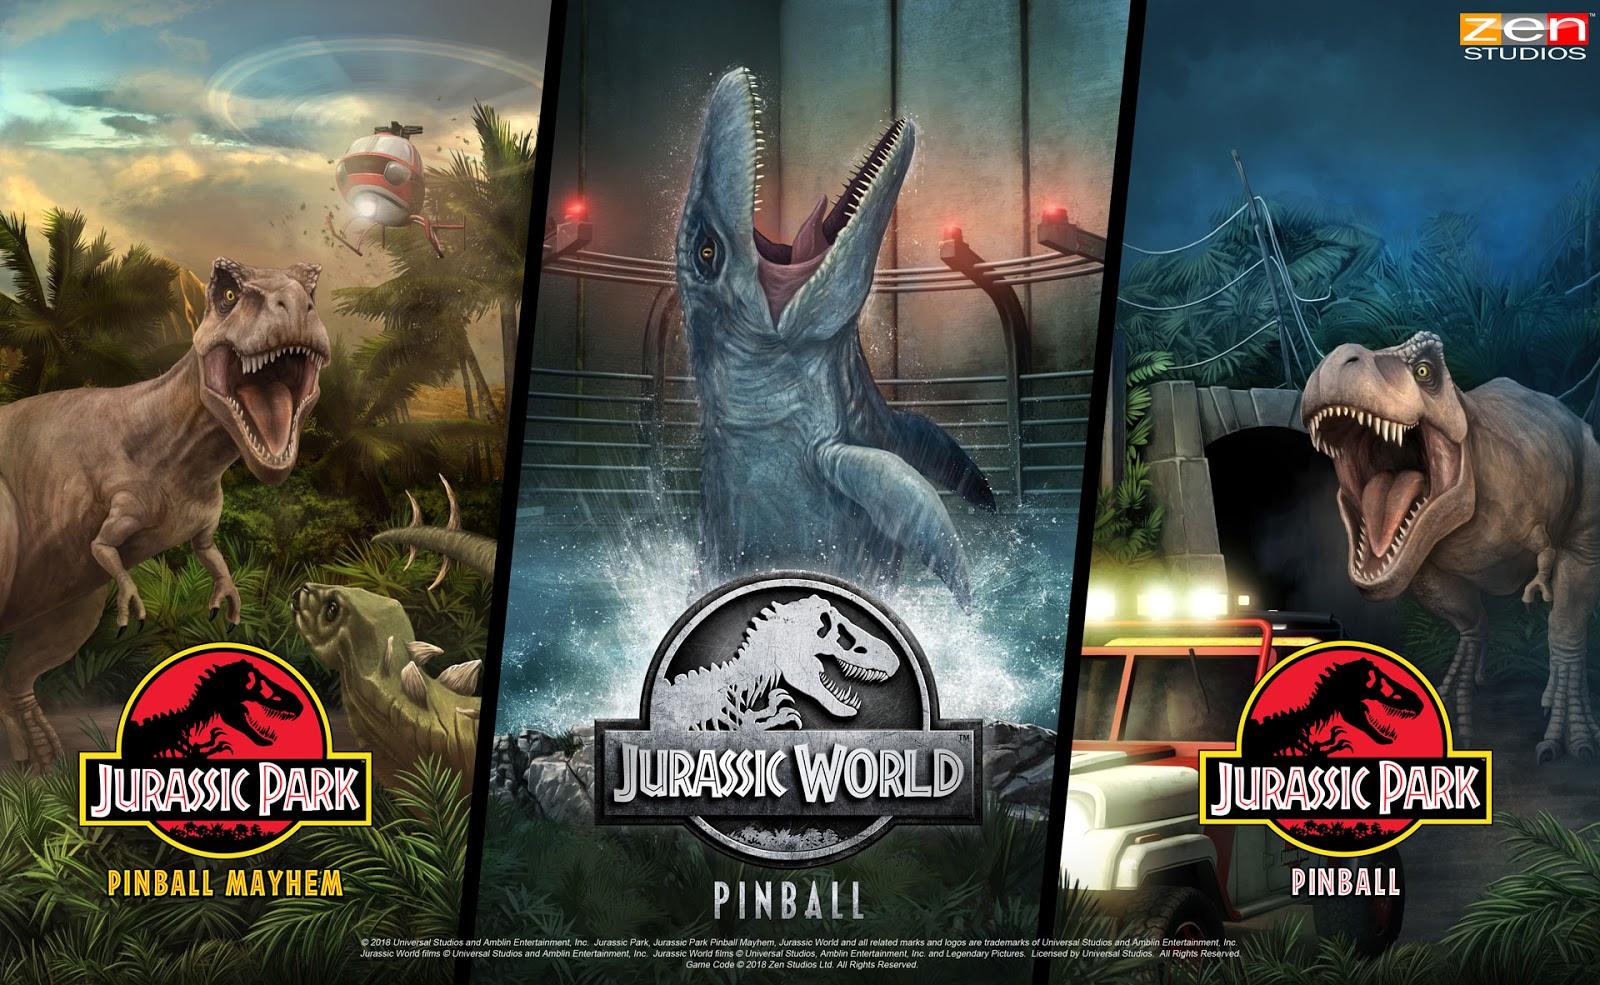 Jurassic World Pinball Roars Onto Pinball FX3 Today for All Major